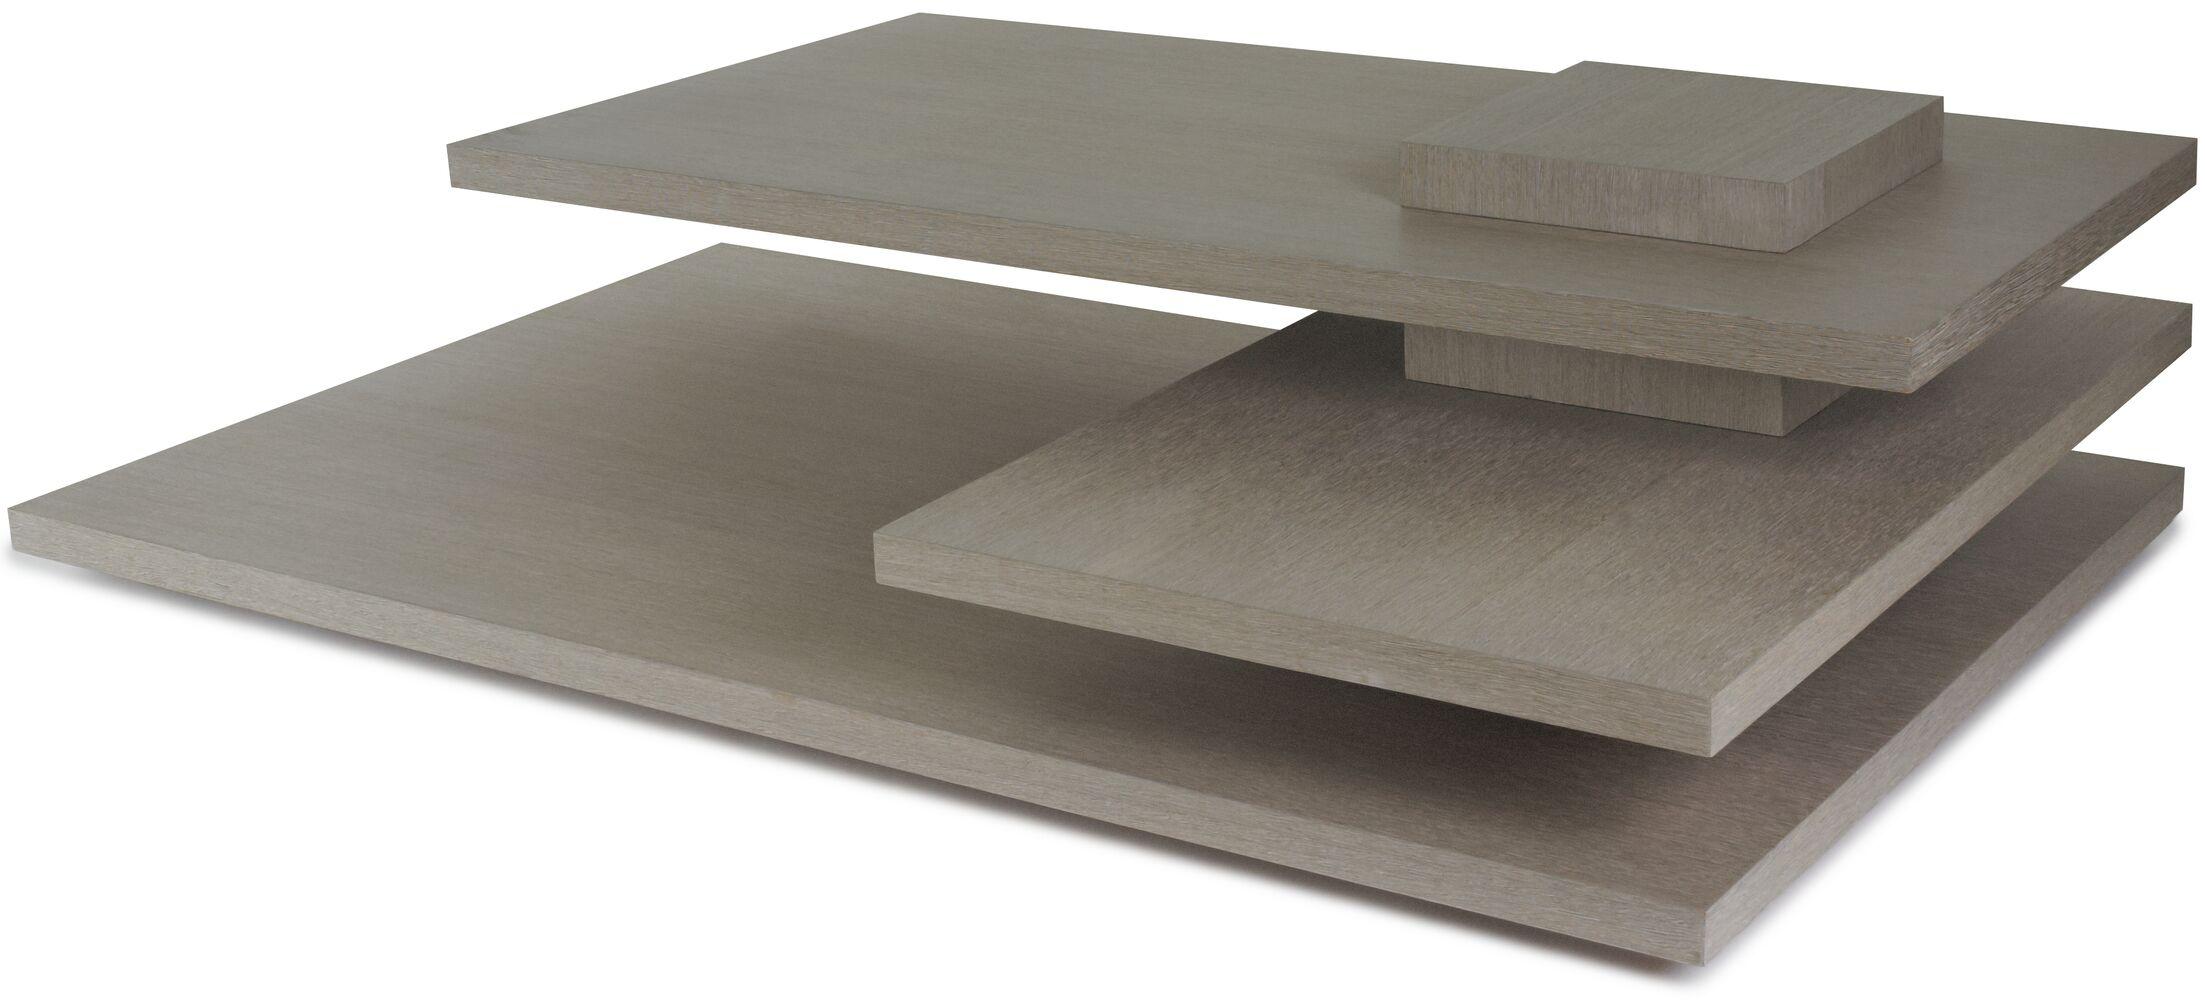 Planar Coffee Table